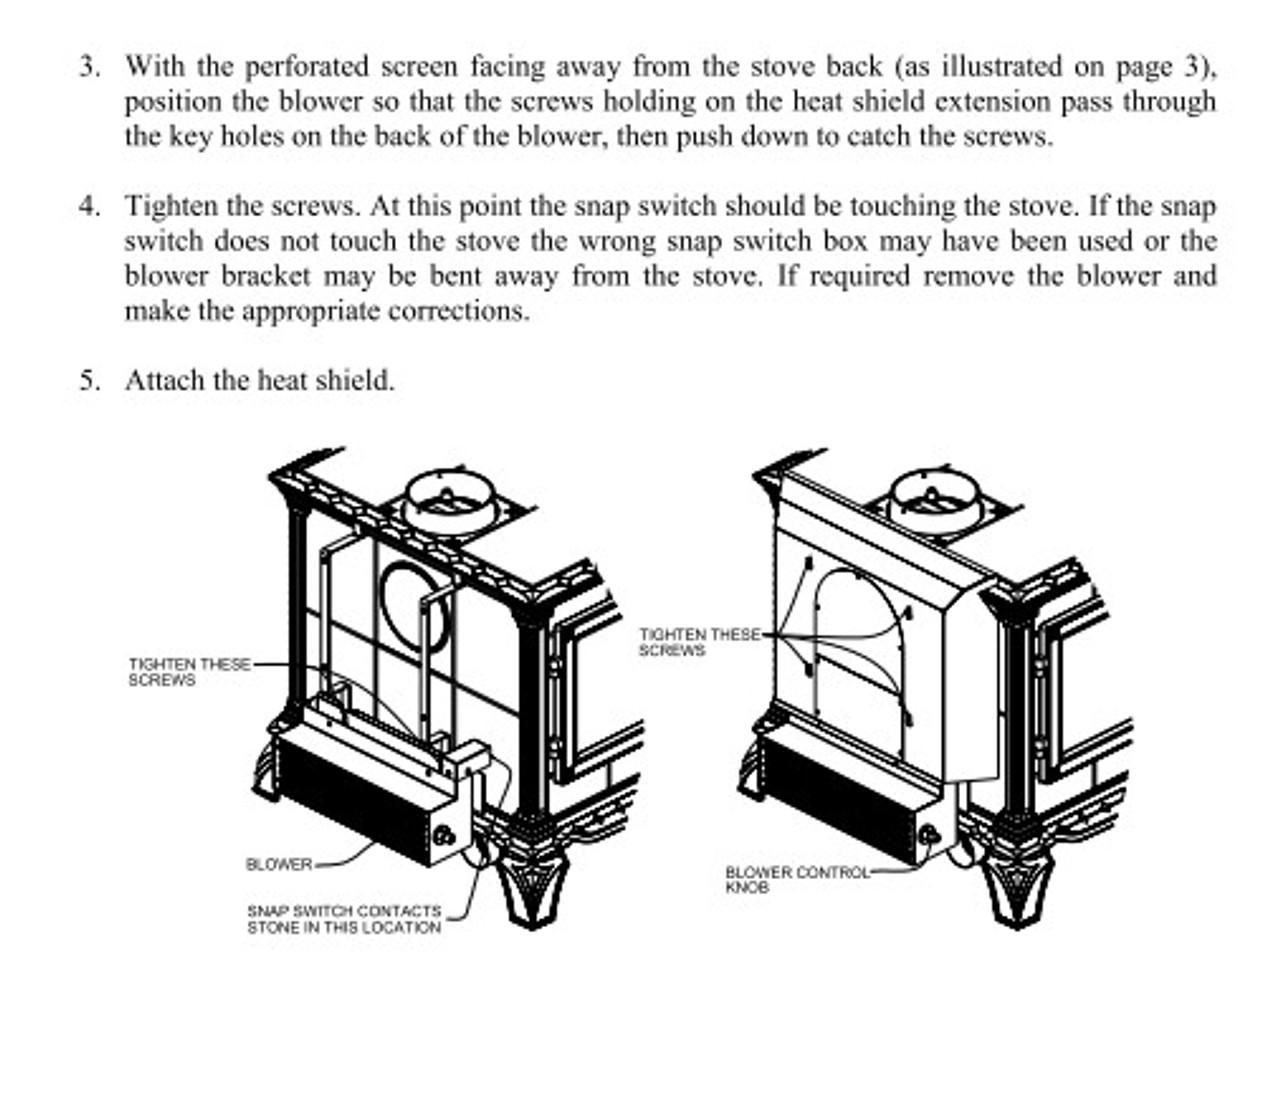 hearthstone blower kit 90 57210 rocky mountain stove \u0026 fireplace  hearthstone blower kit 90 57210